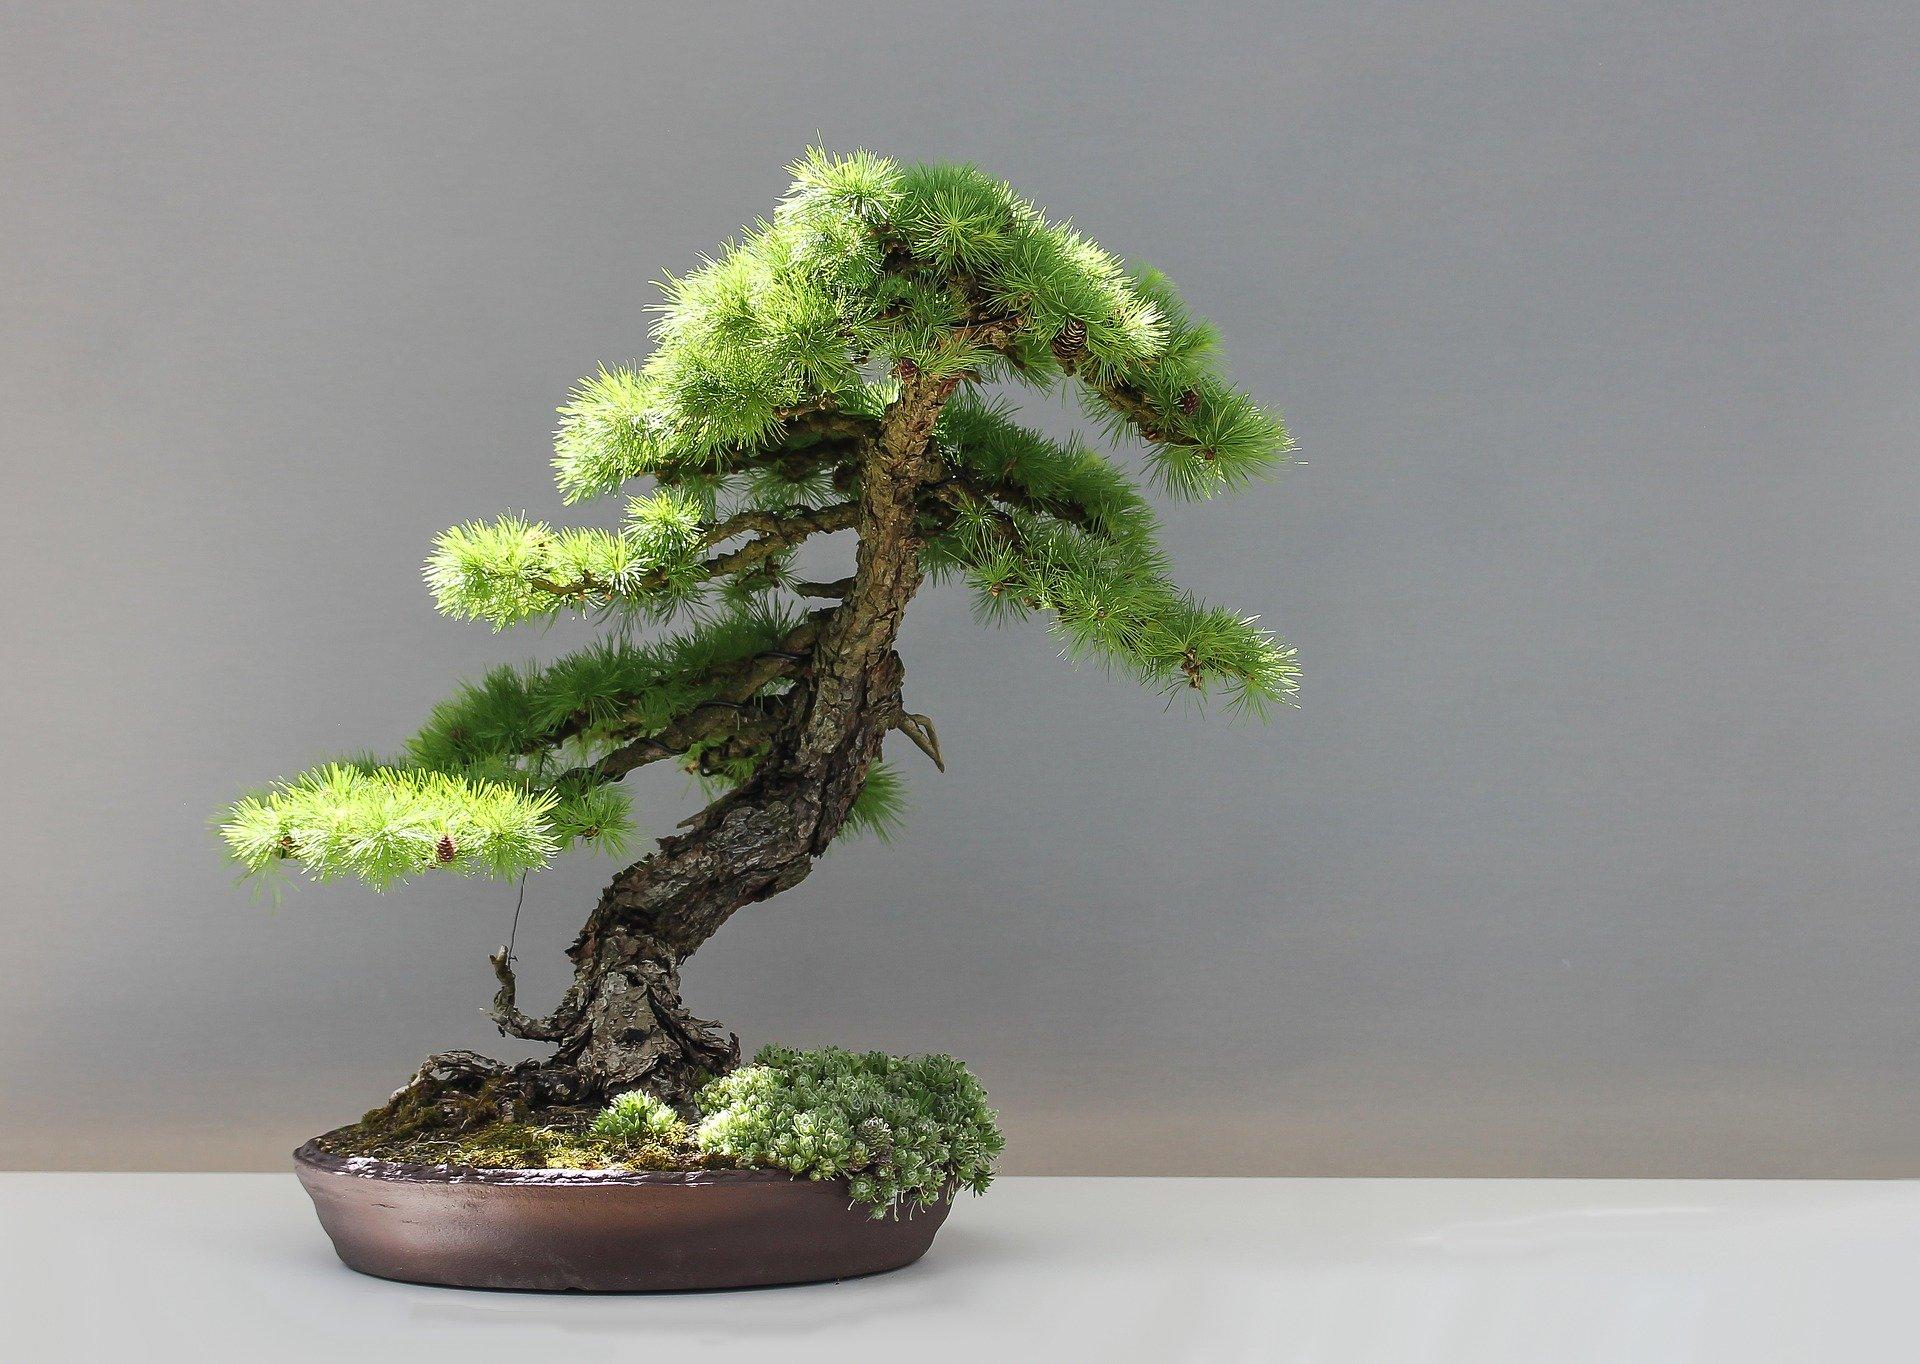 bonsai-1805499_1920.jpg